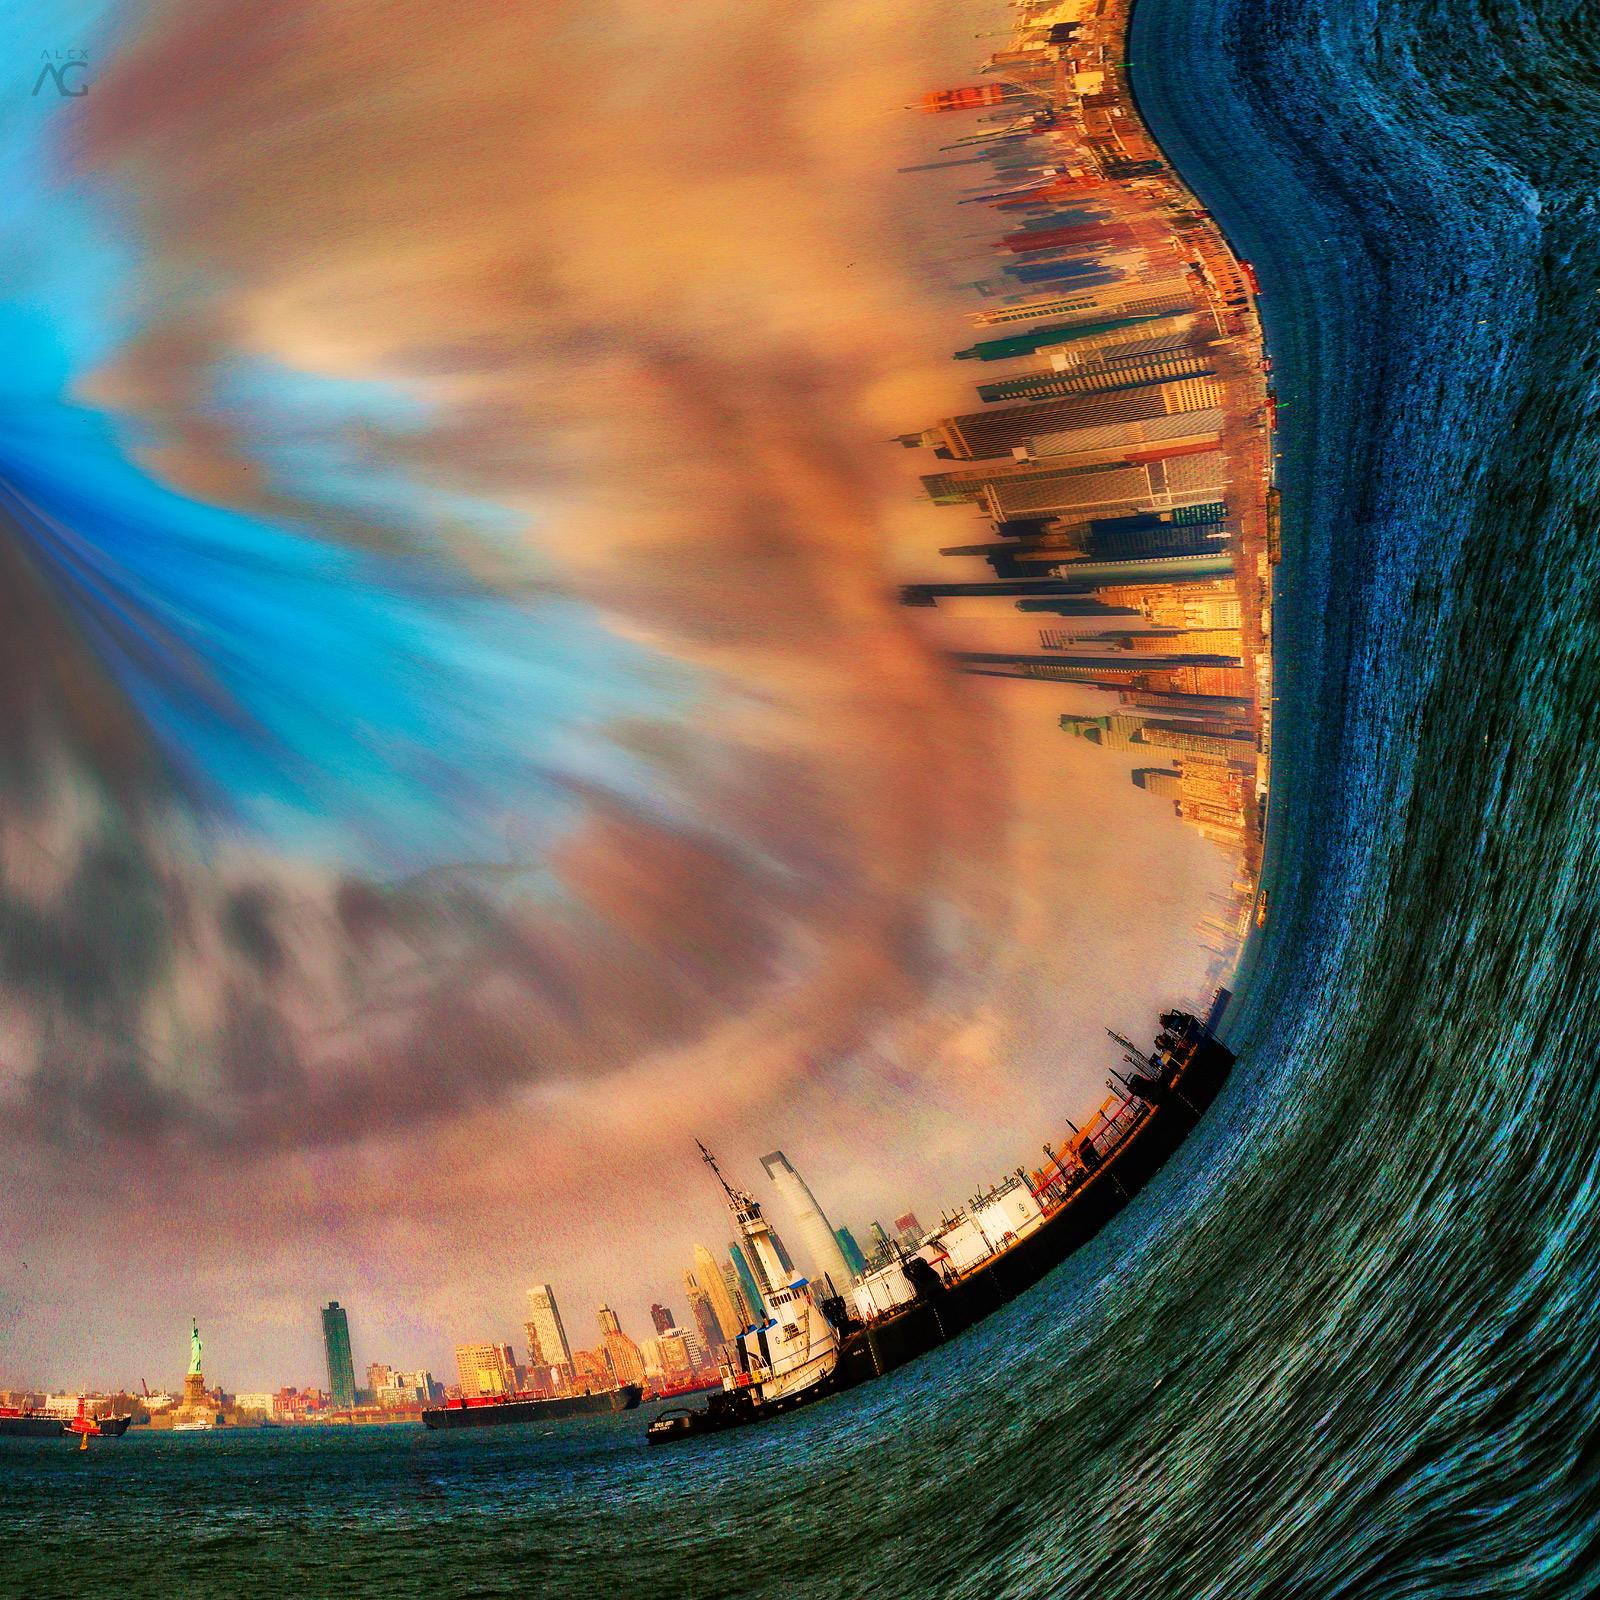 CloudsOverHudsonFromRedHookManhattanDowntownAndShip_curved_1600